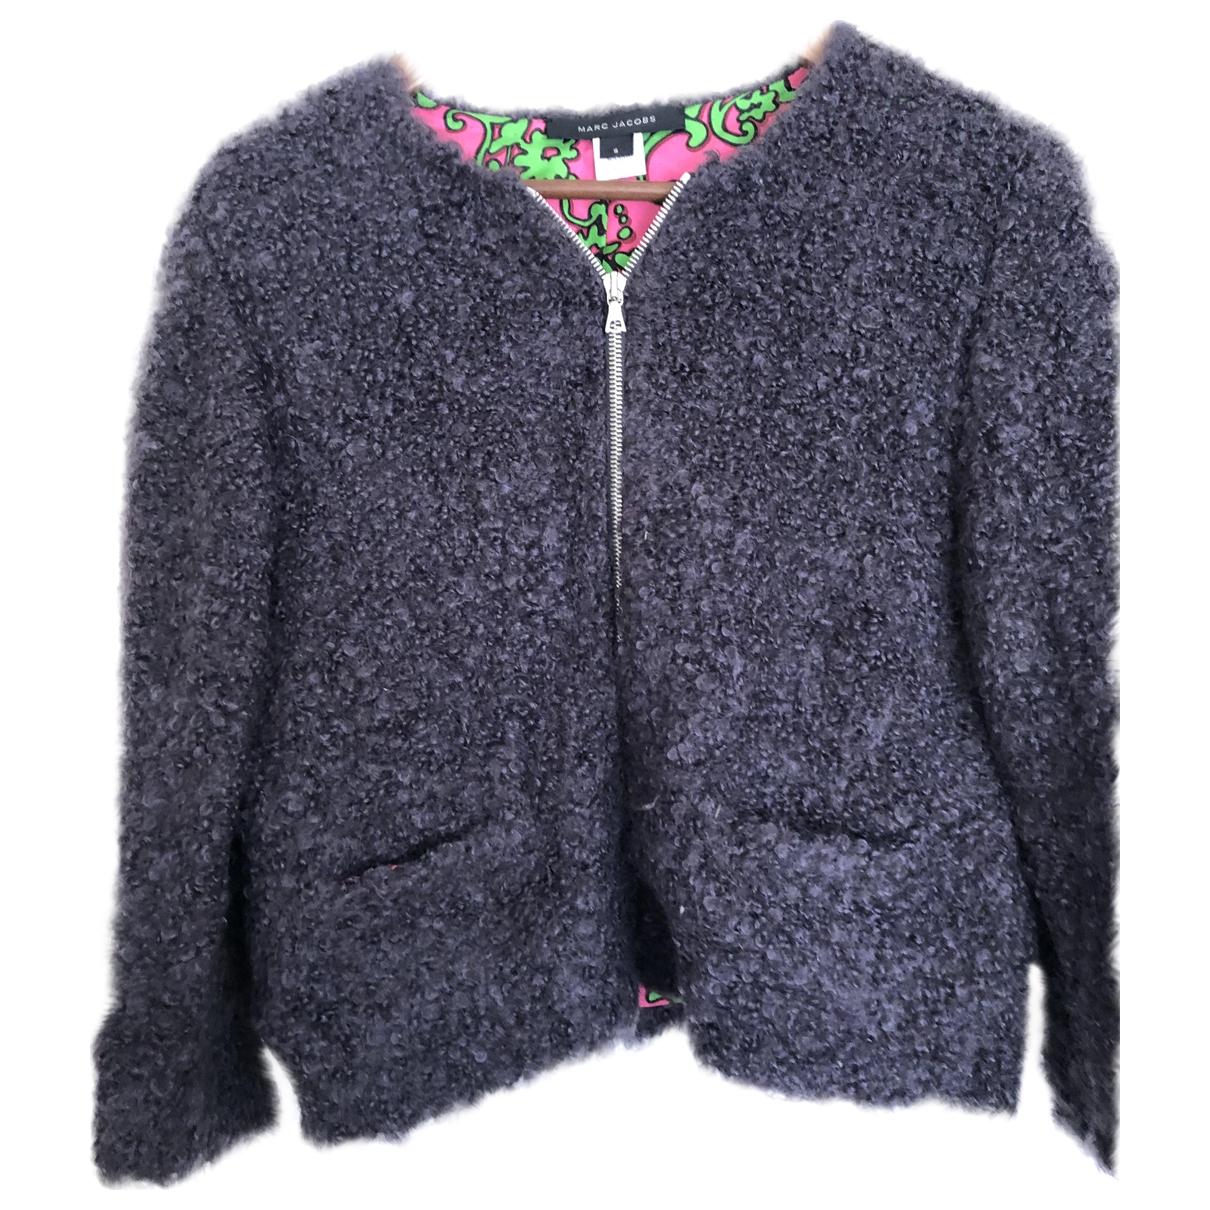 Marc Jacobs \N Grey Wool jacket for Women 36 FR